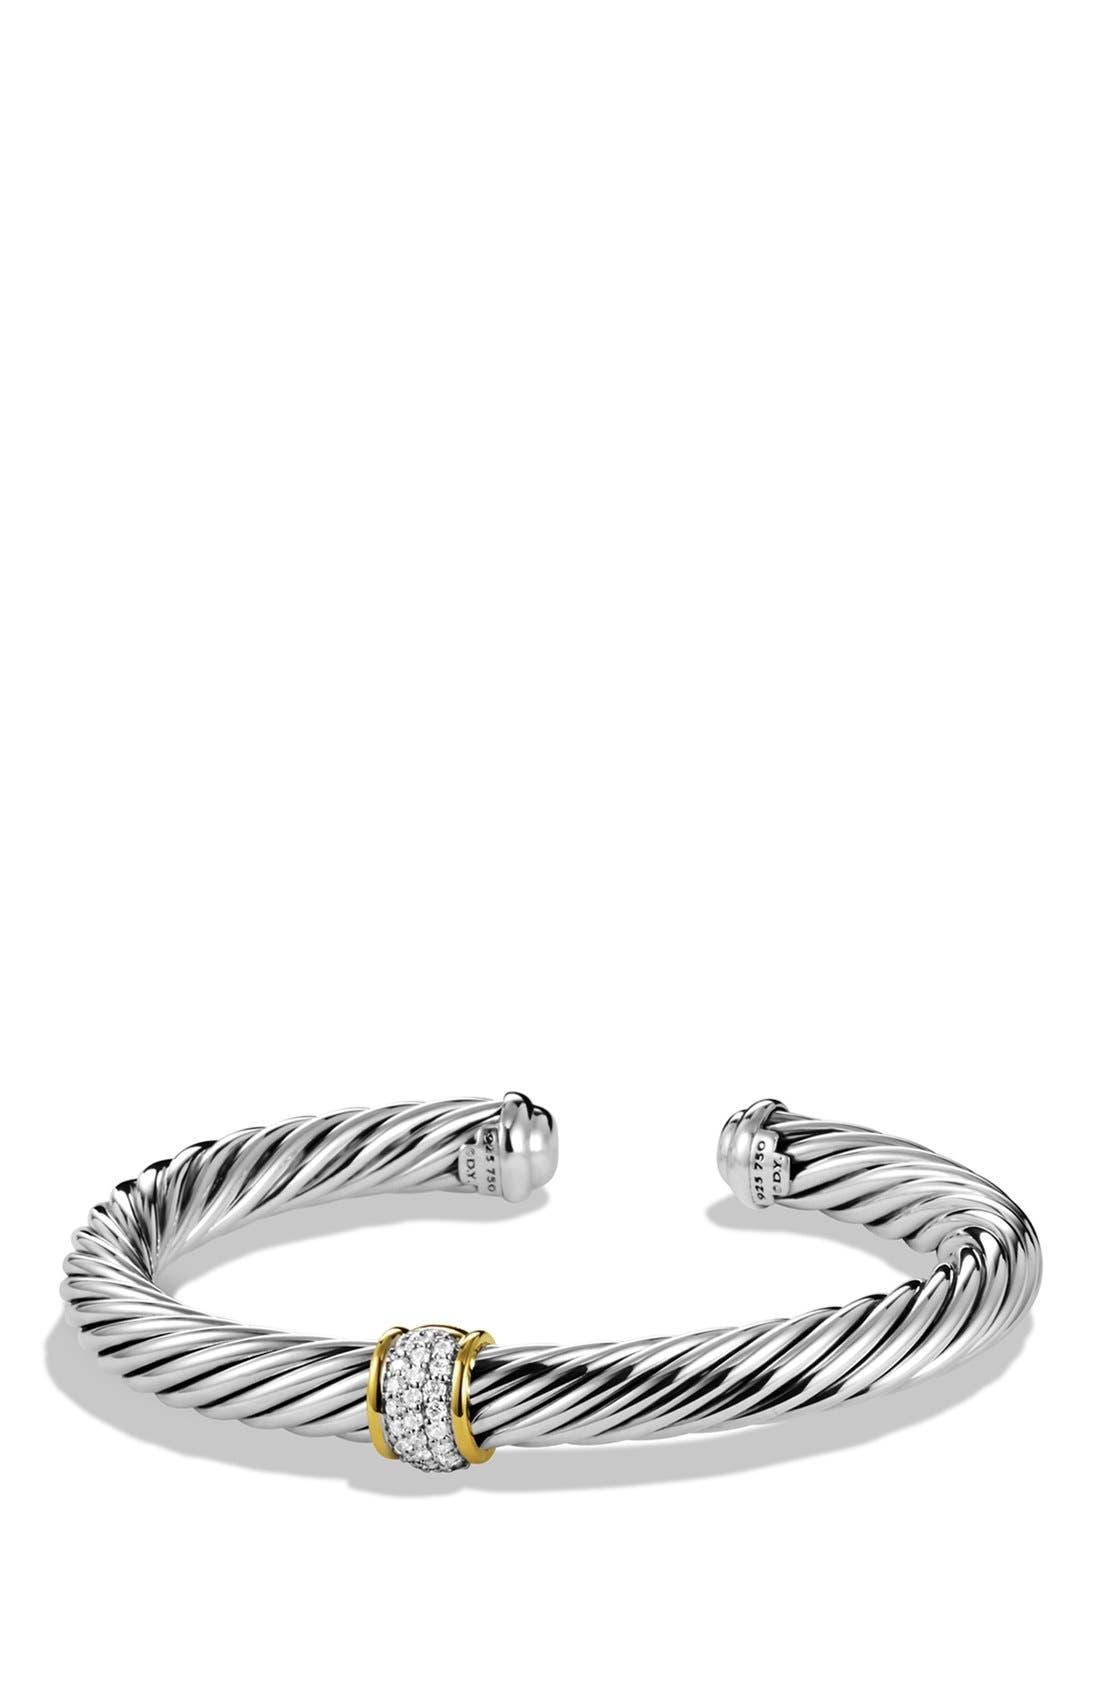 Main Image - David Yurman 'Cable Classics' Bracelet with Diamonds and Gold